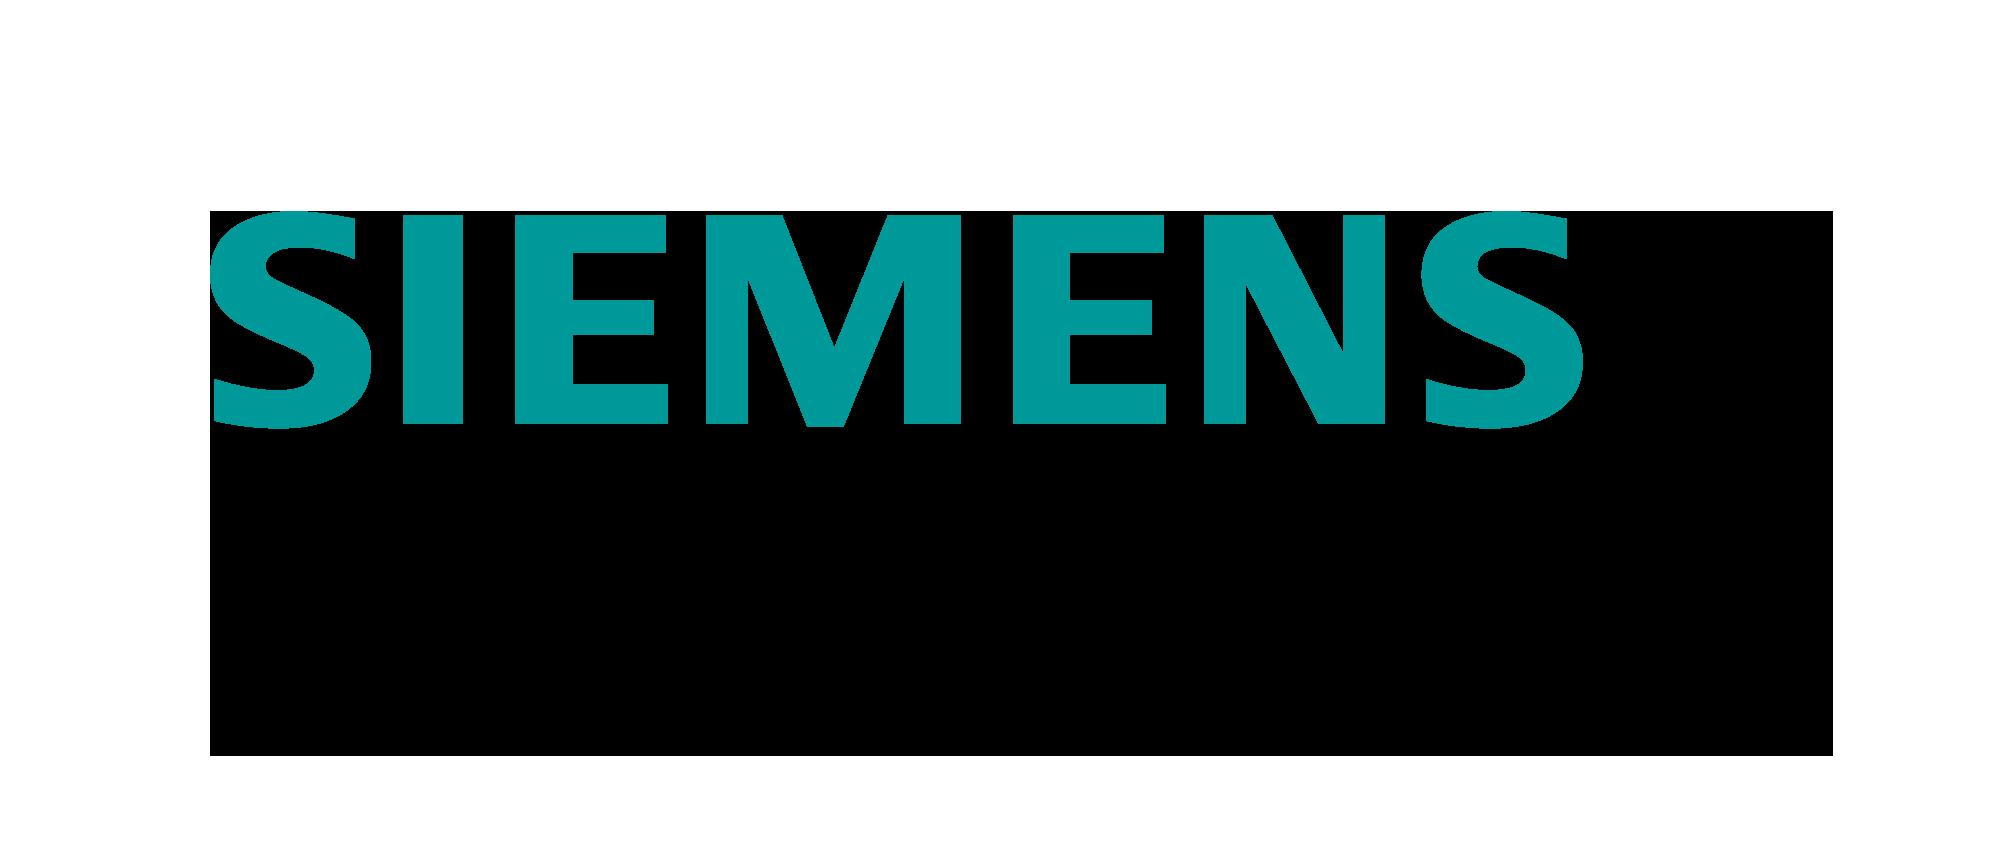 Download Siemens Ingenuity for life logo til web - Siemens PNG